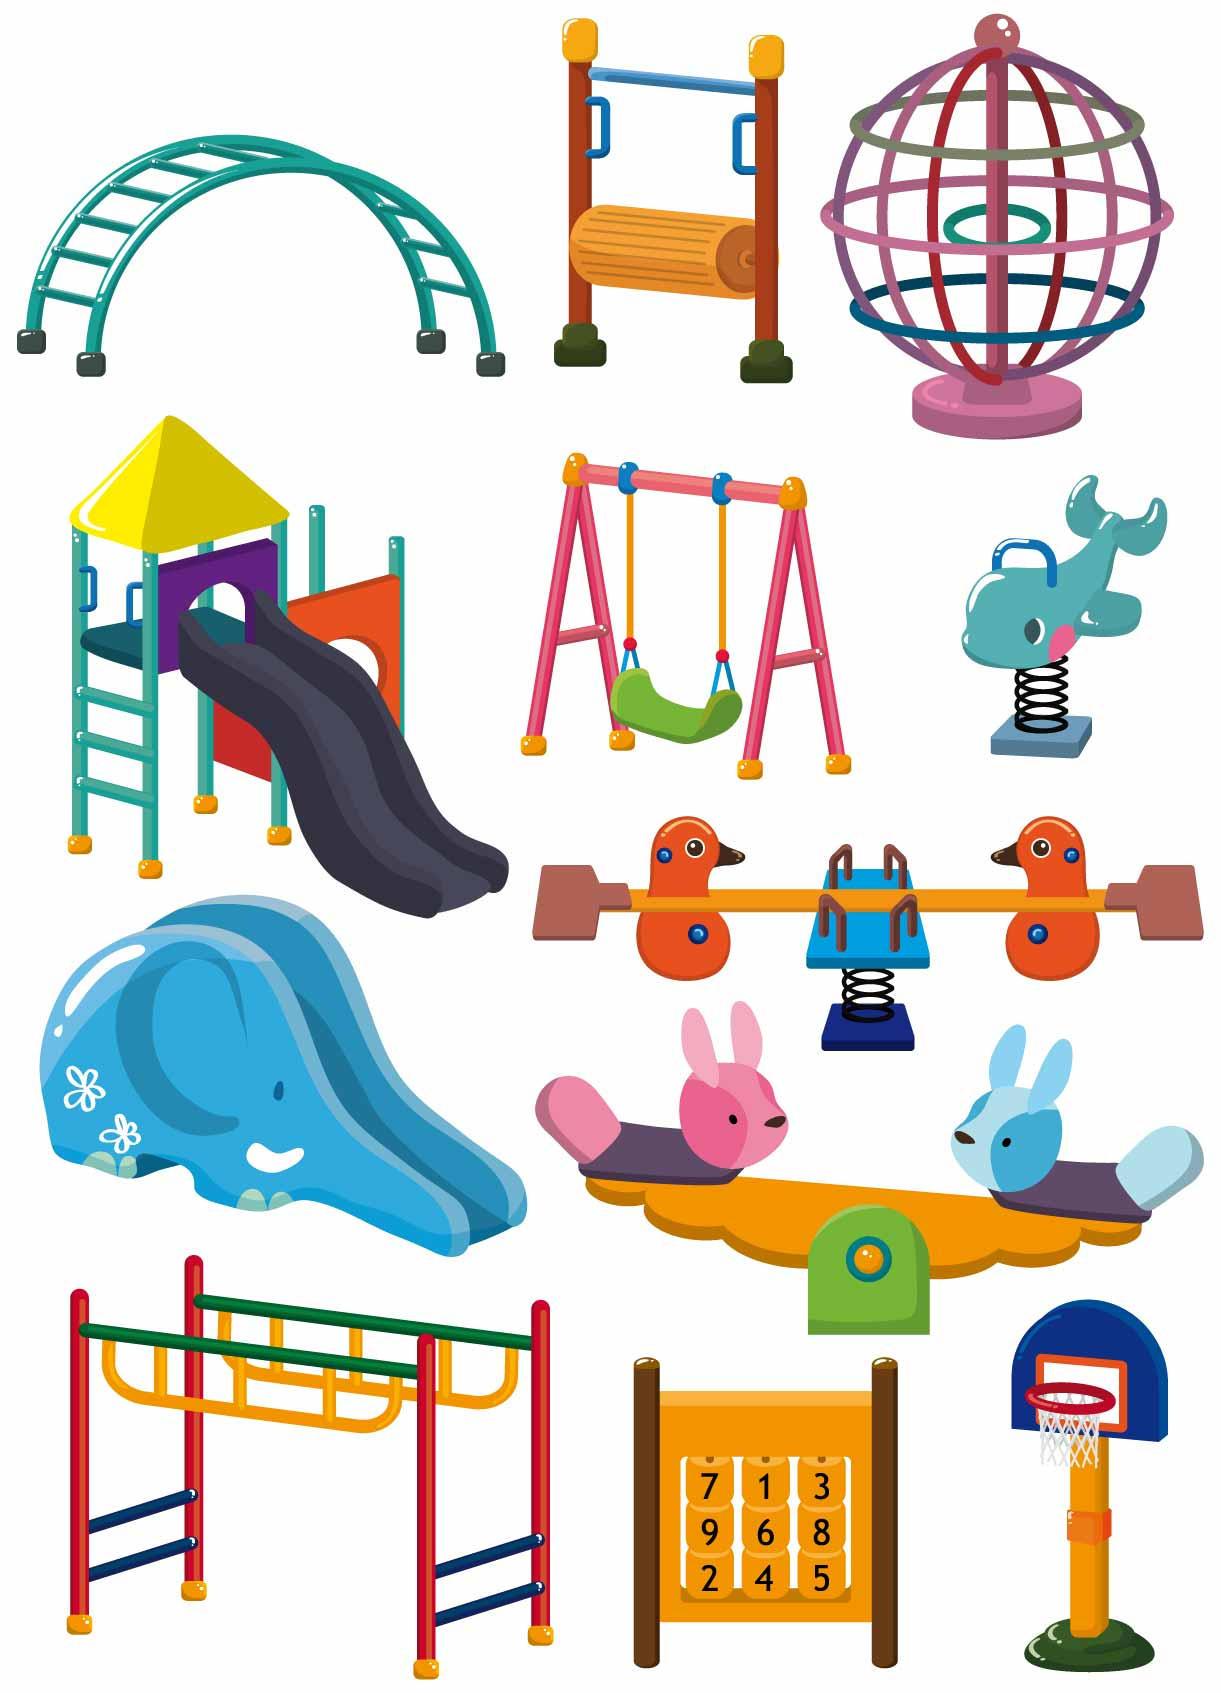 Juegos infantiles EPS by GianFerdinand